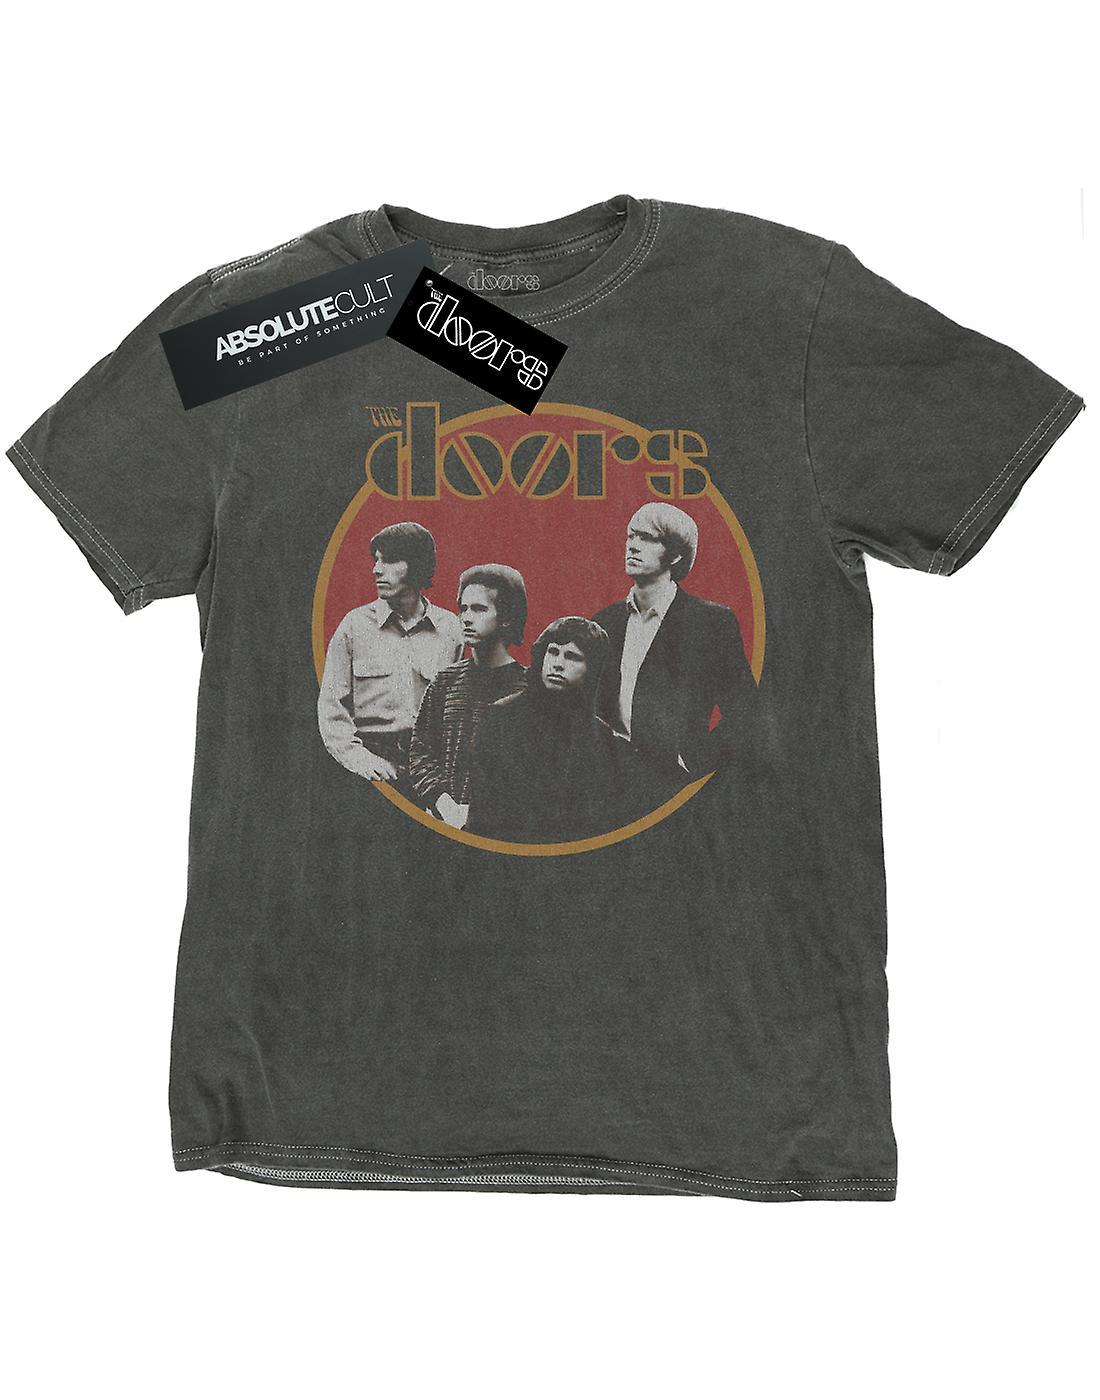 The Doors Men's Retro Band Circle Washed T-Shirt